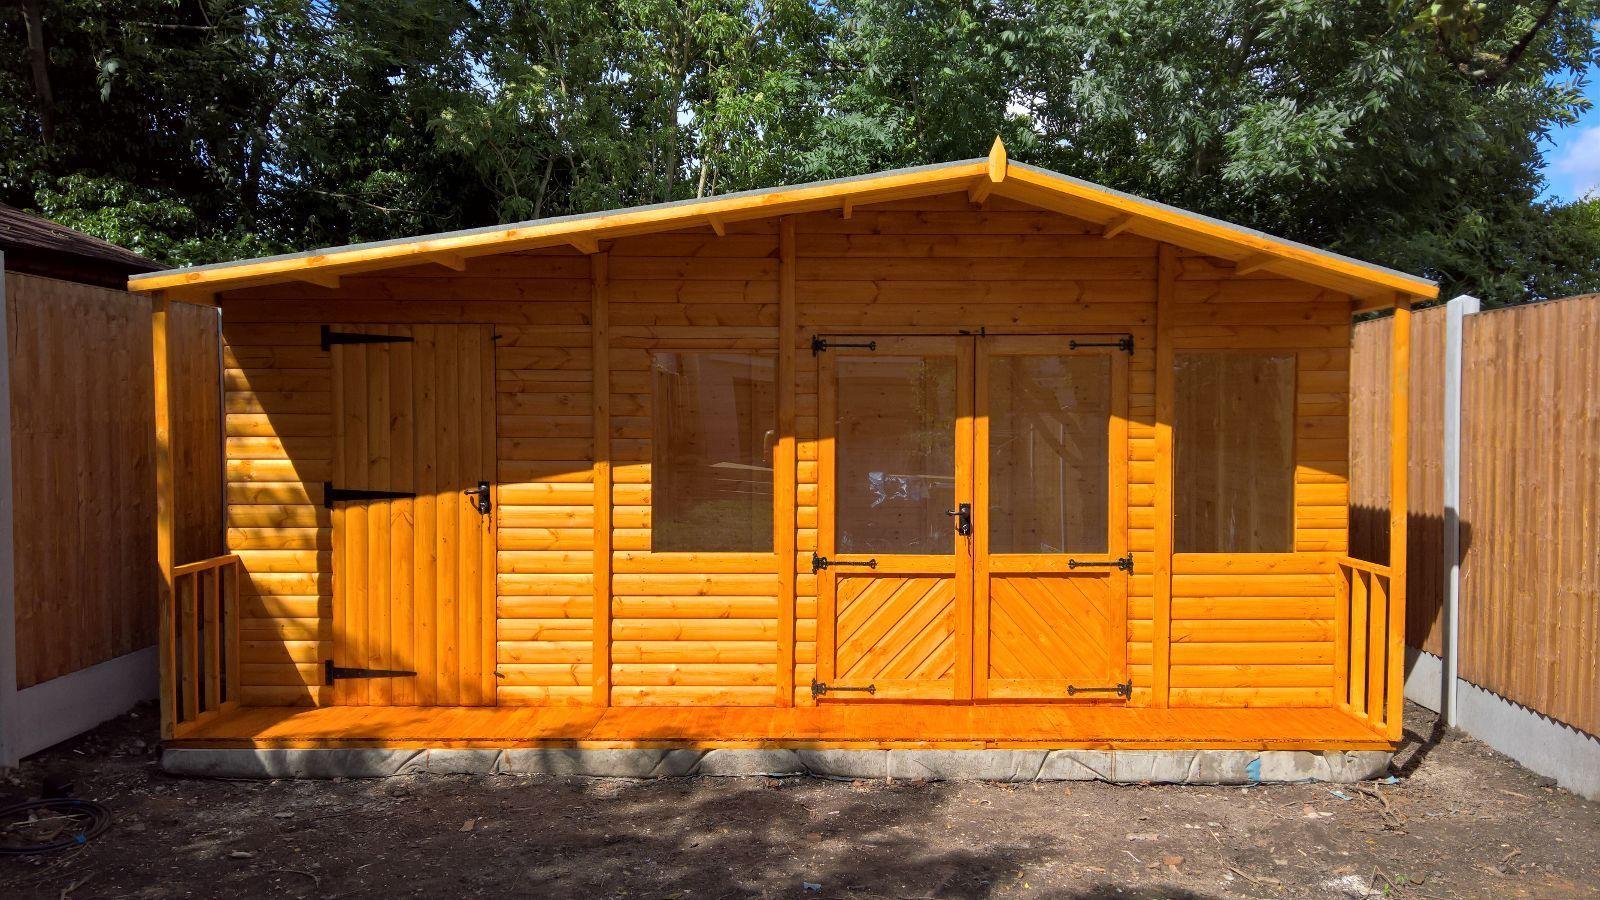 18x12 Large Summer House Storage Shed